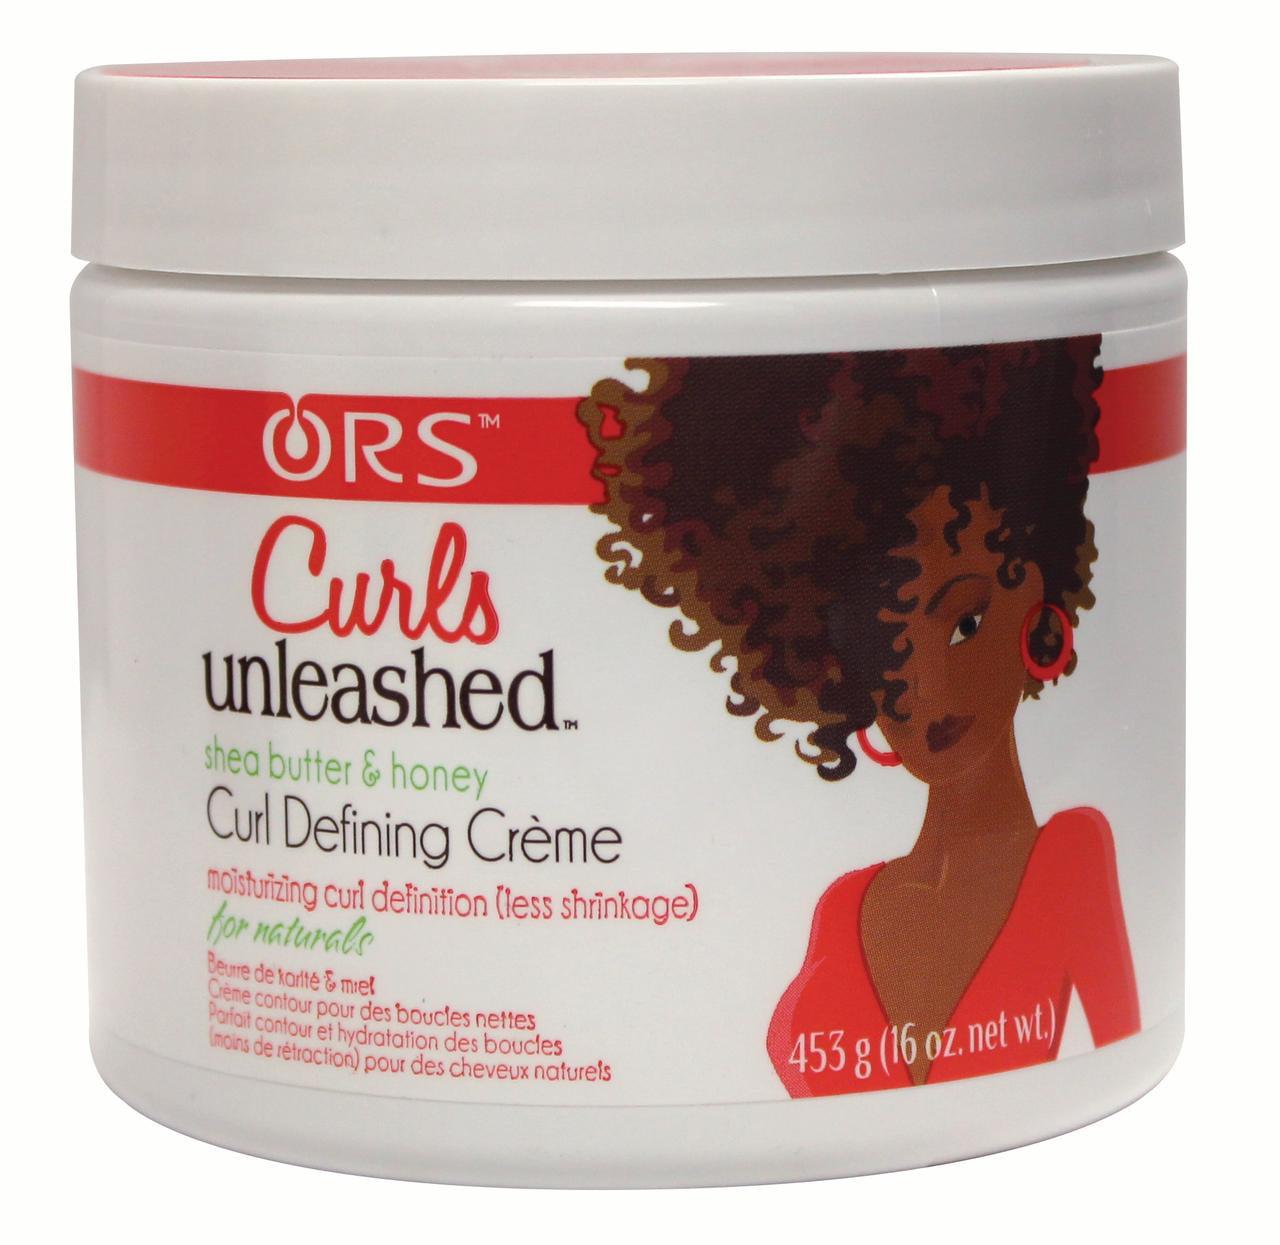 Ors Curls Unleashed Curl Defining Creme 16 Oz Walmart Com